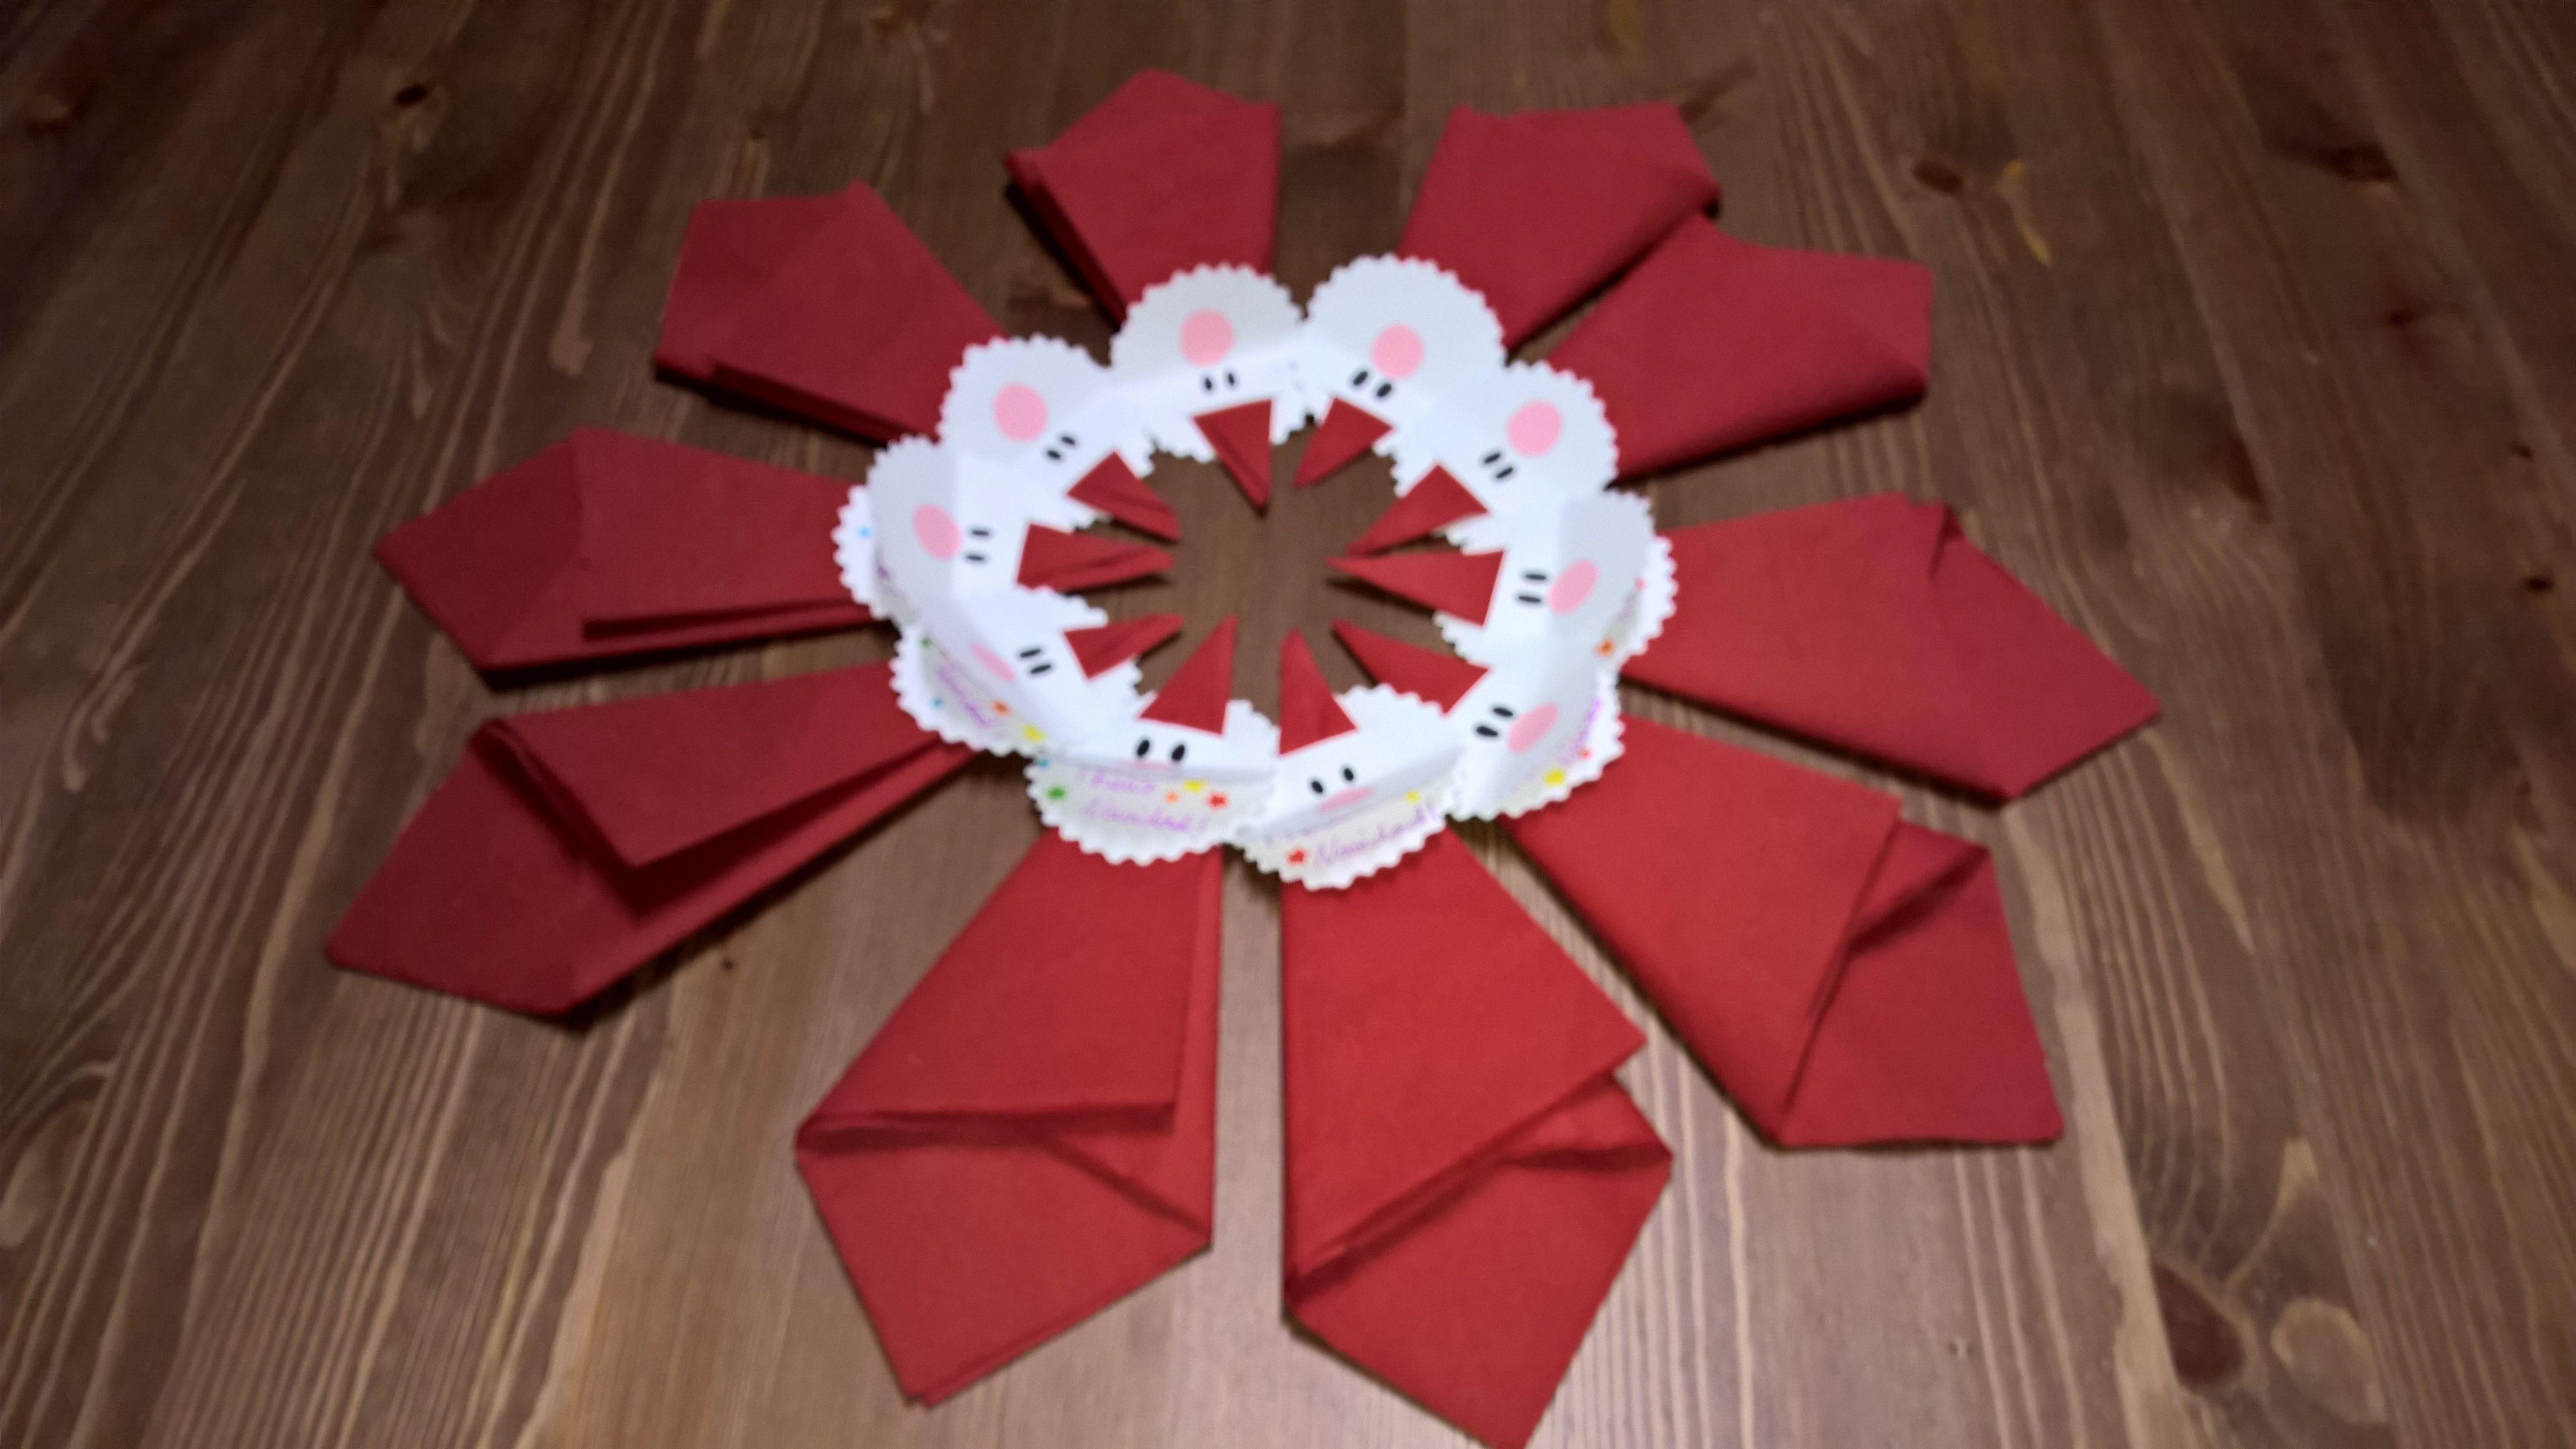 Servilleteros para adornar la mesa de Navidad